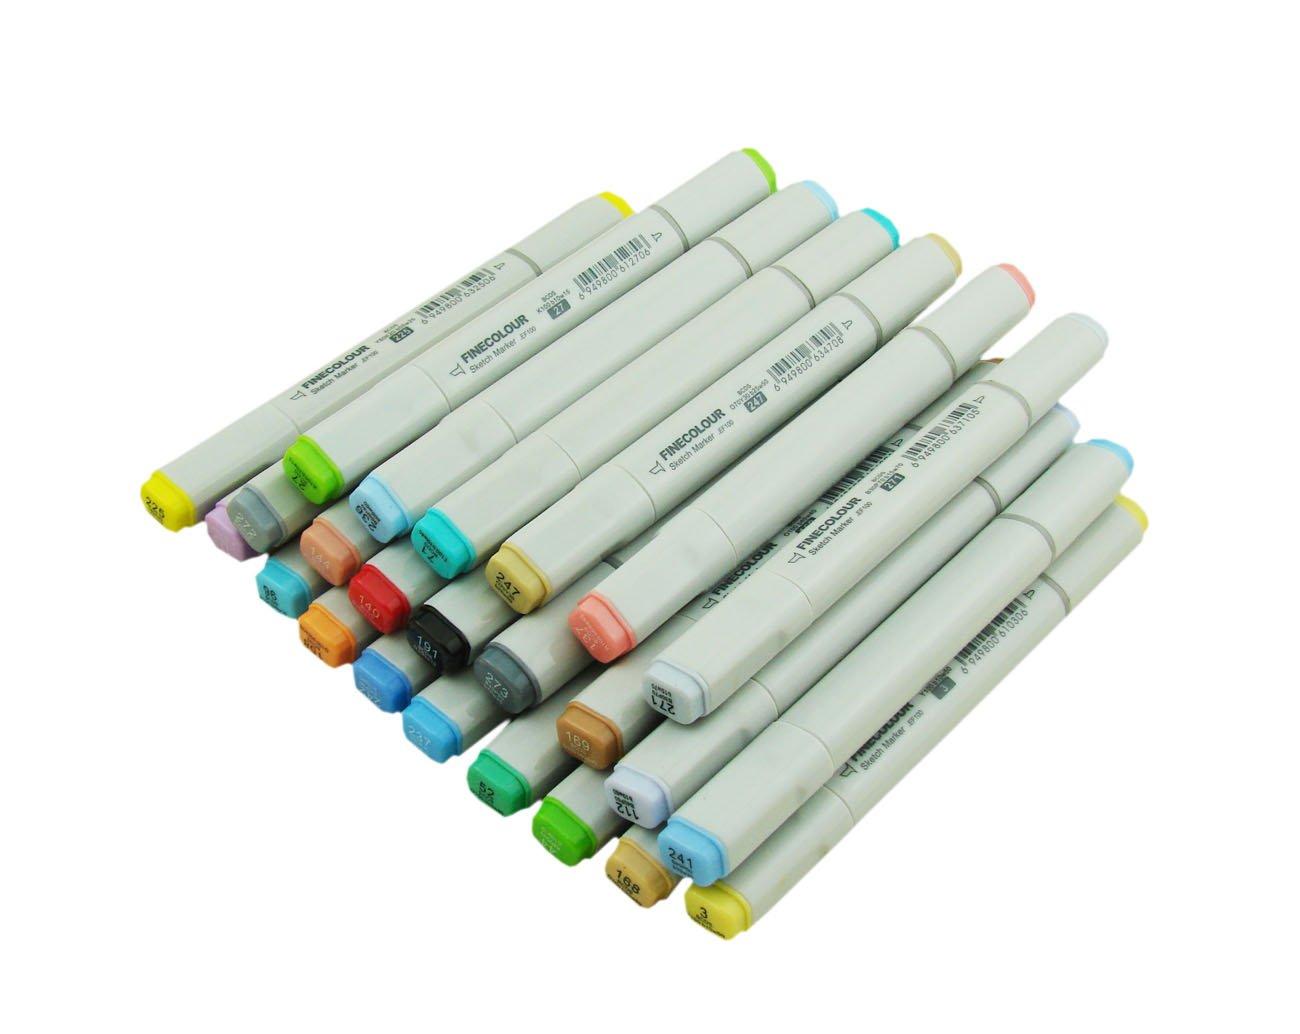 Erofa® finecolour – Rotuladores Juego de artista artista artista necesario pincel/marcadores recargables y reemplazables puntas con bolso de la pluma (24), color 60 da60b9